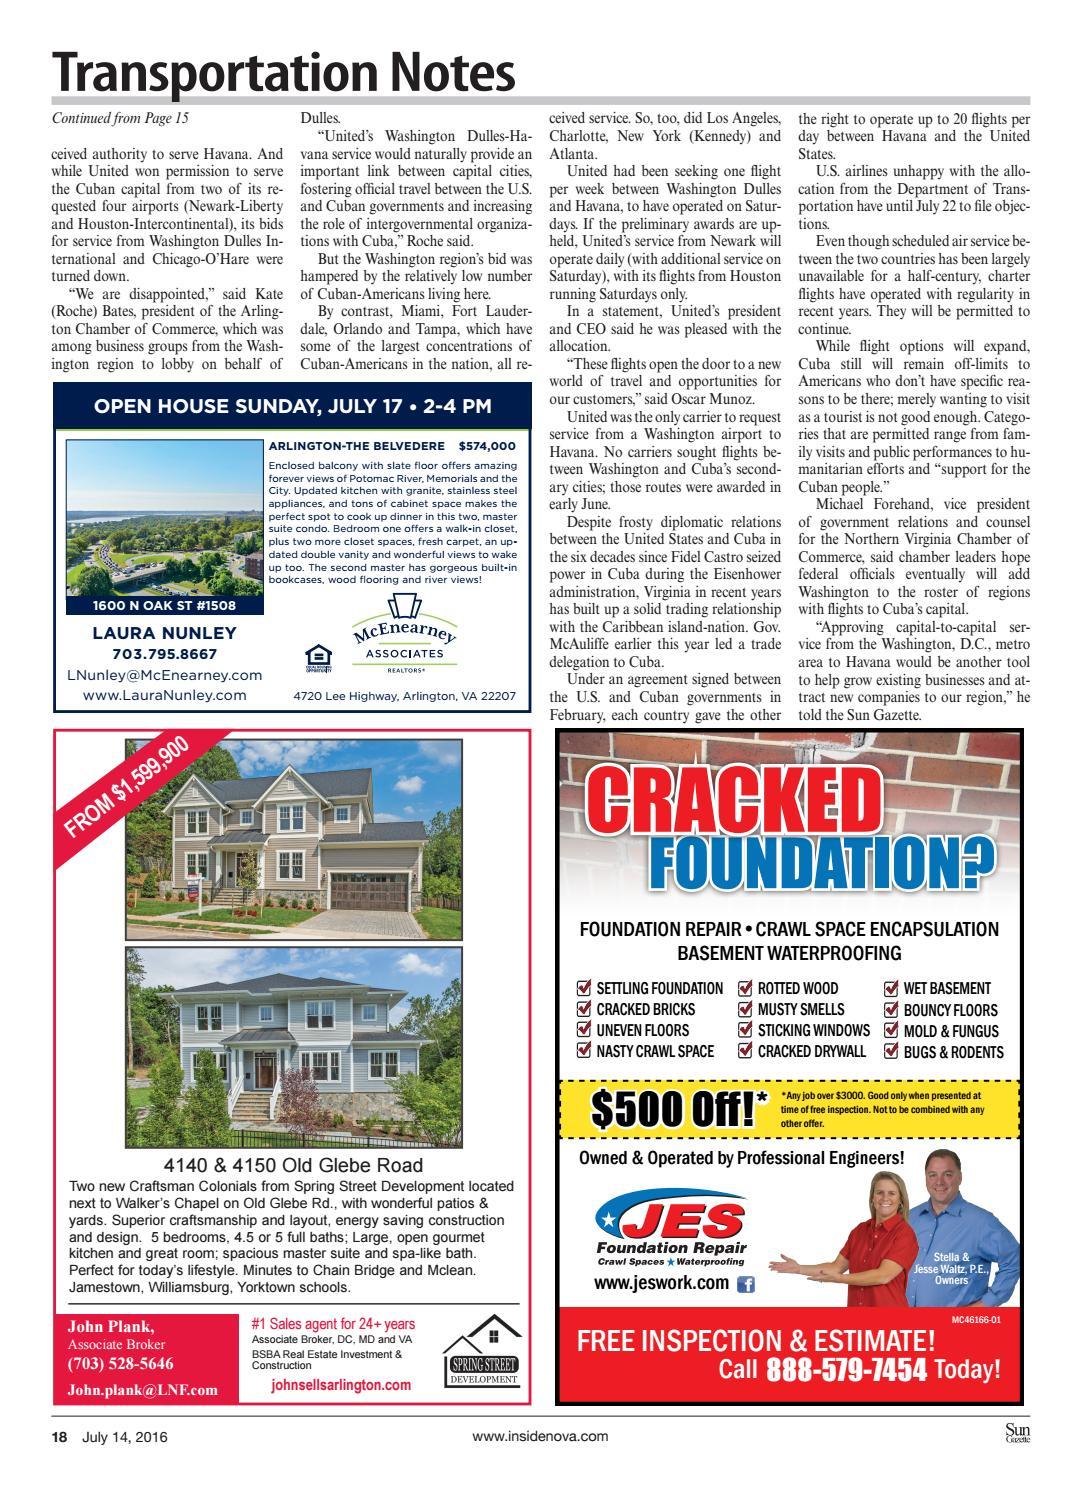 Sun Gazette Arlington, July 14, 2016 by InsideNoVa - issuu